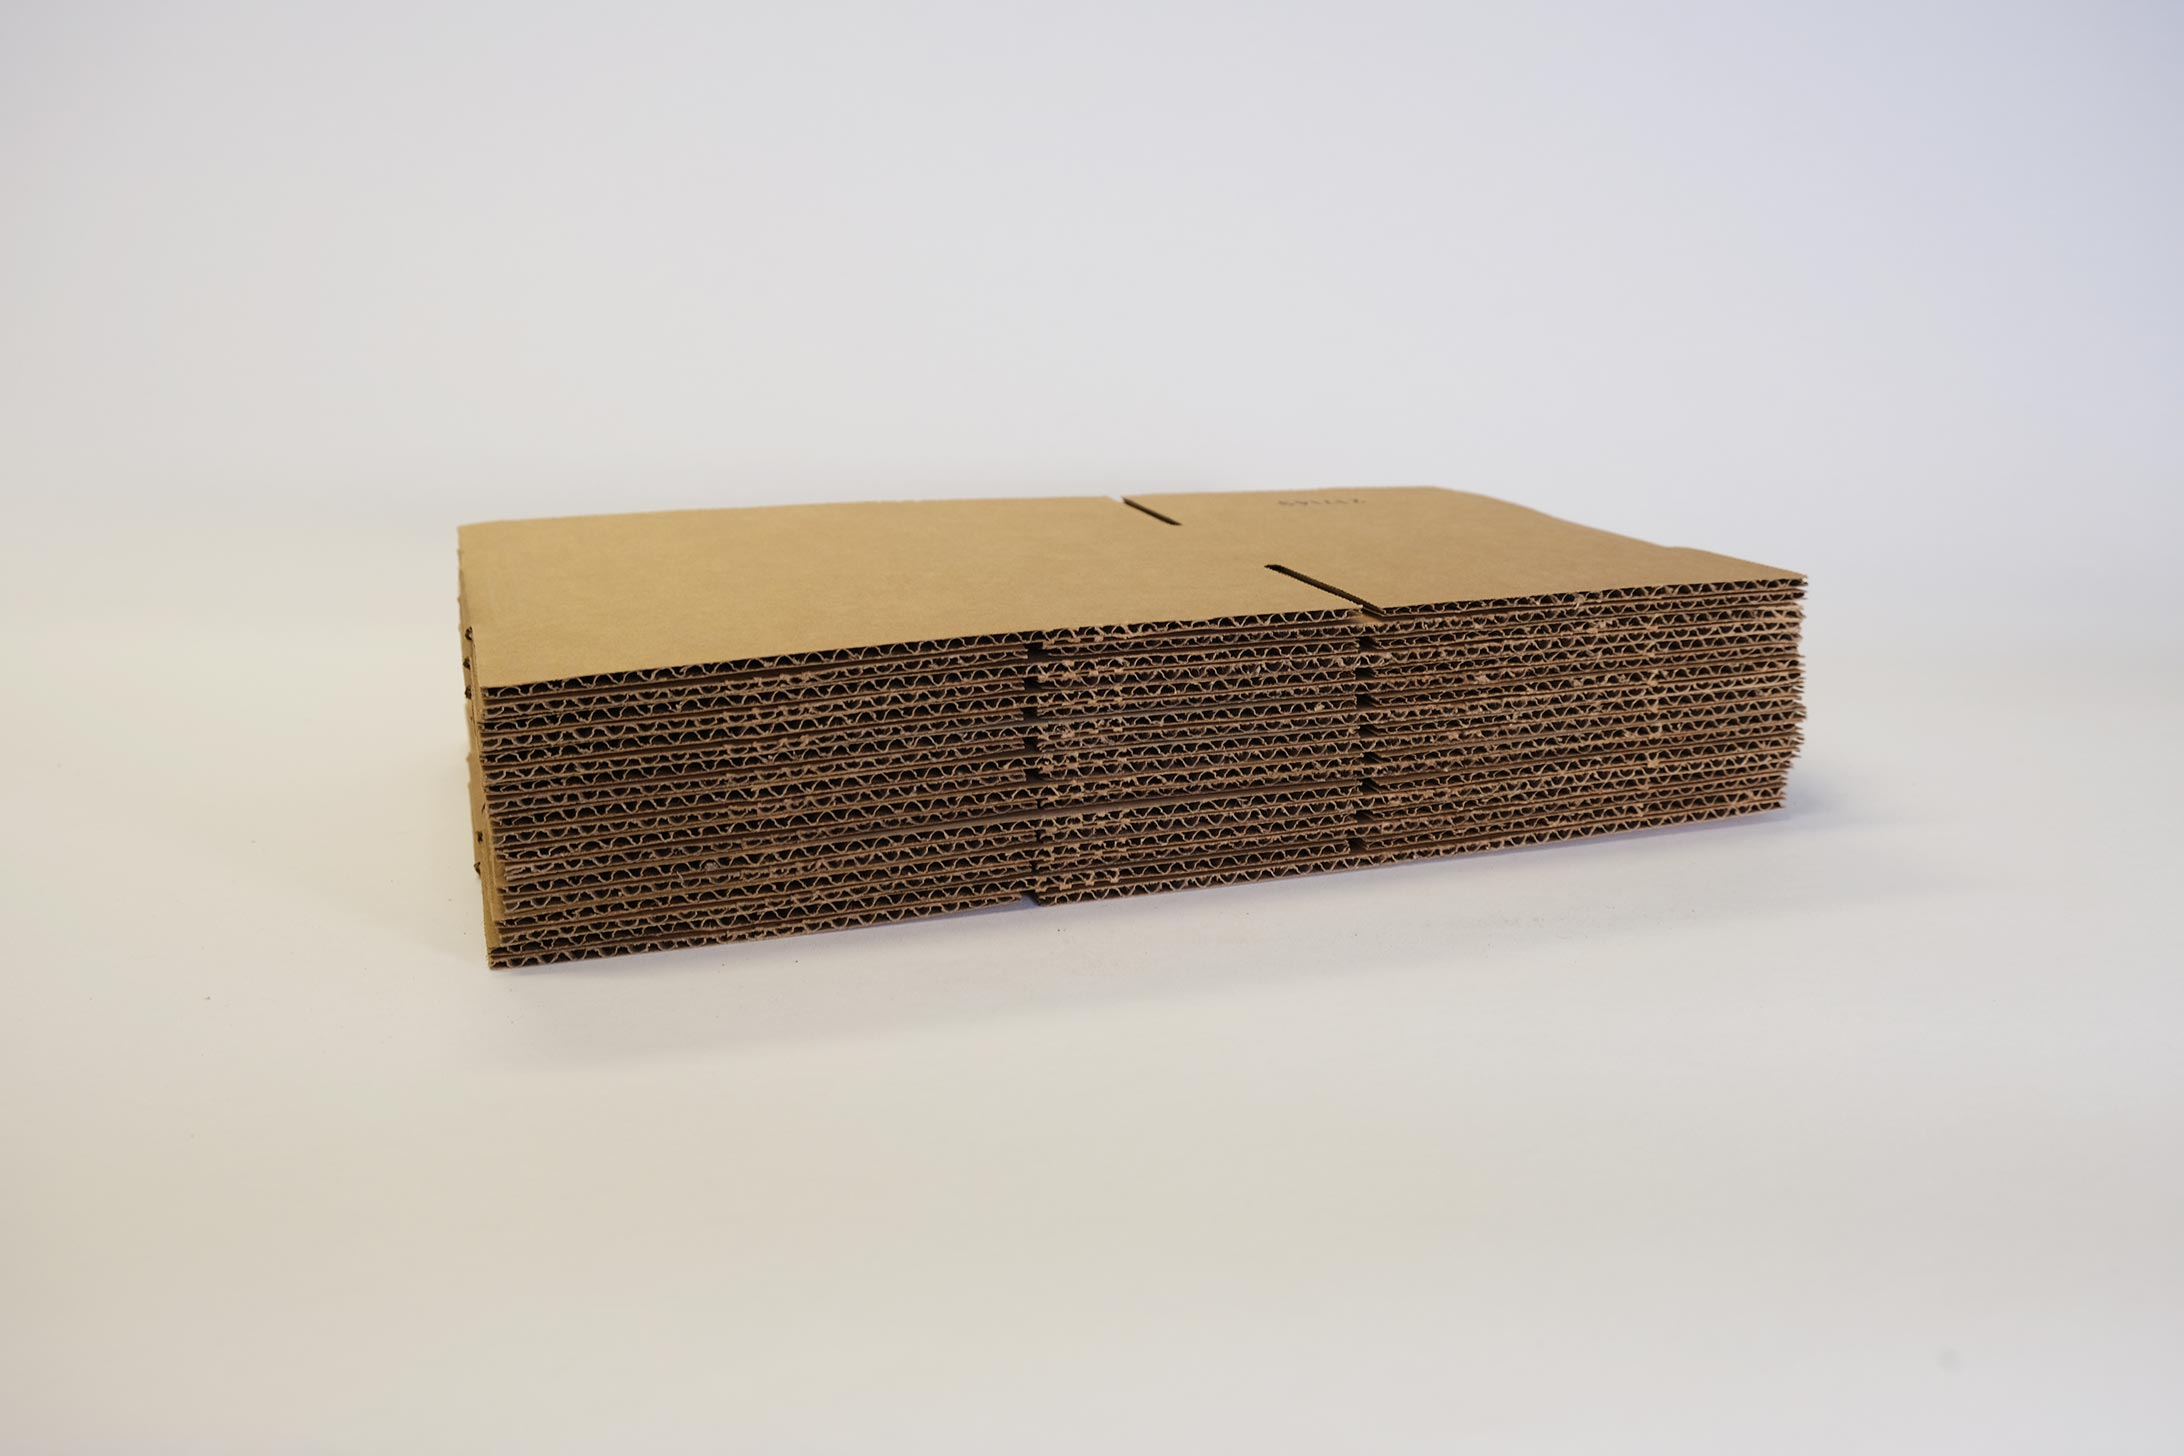 Quantity of Boxes